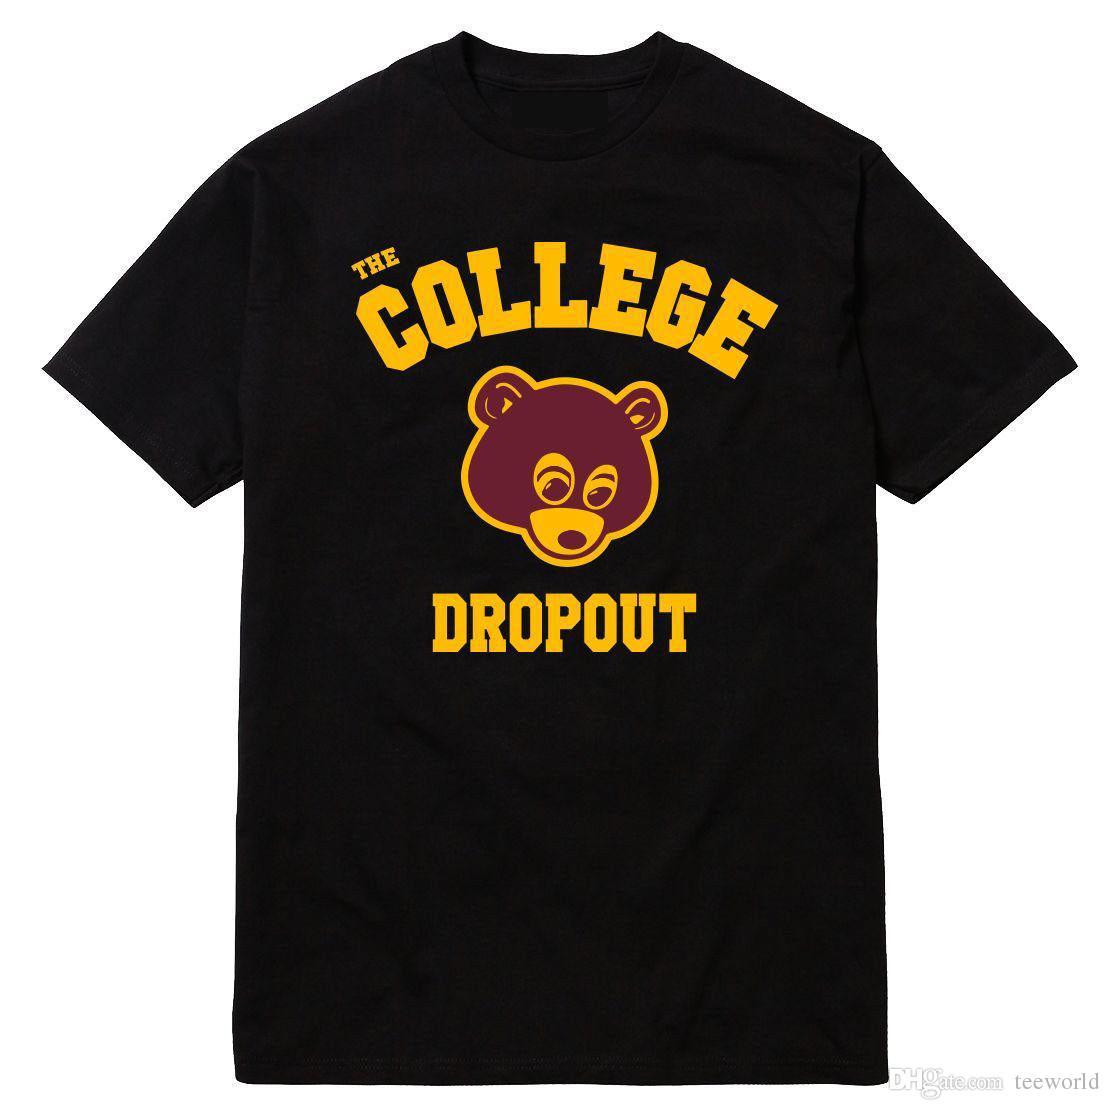 ac6c851db7b74 College Dropout T Shirt Kanye West Bound Wholesale Yeezus Good Black  White T  Shirt T Shirt Men Man S Homme Short Sleeve Crewneck Cotton Big Humorous Tee  ...